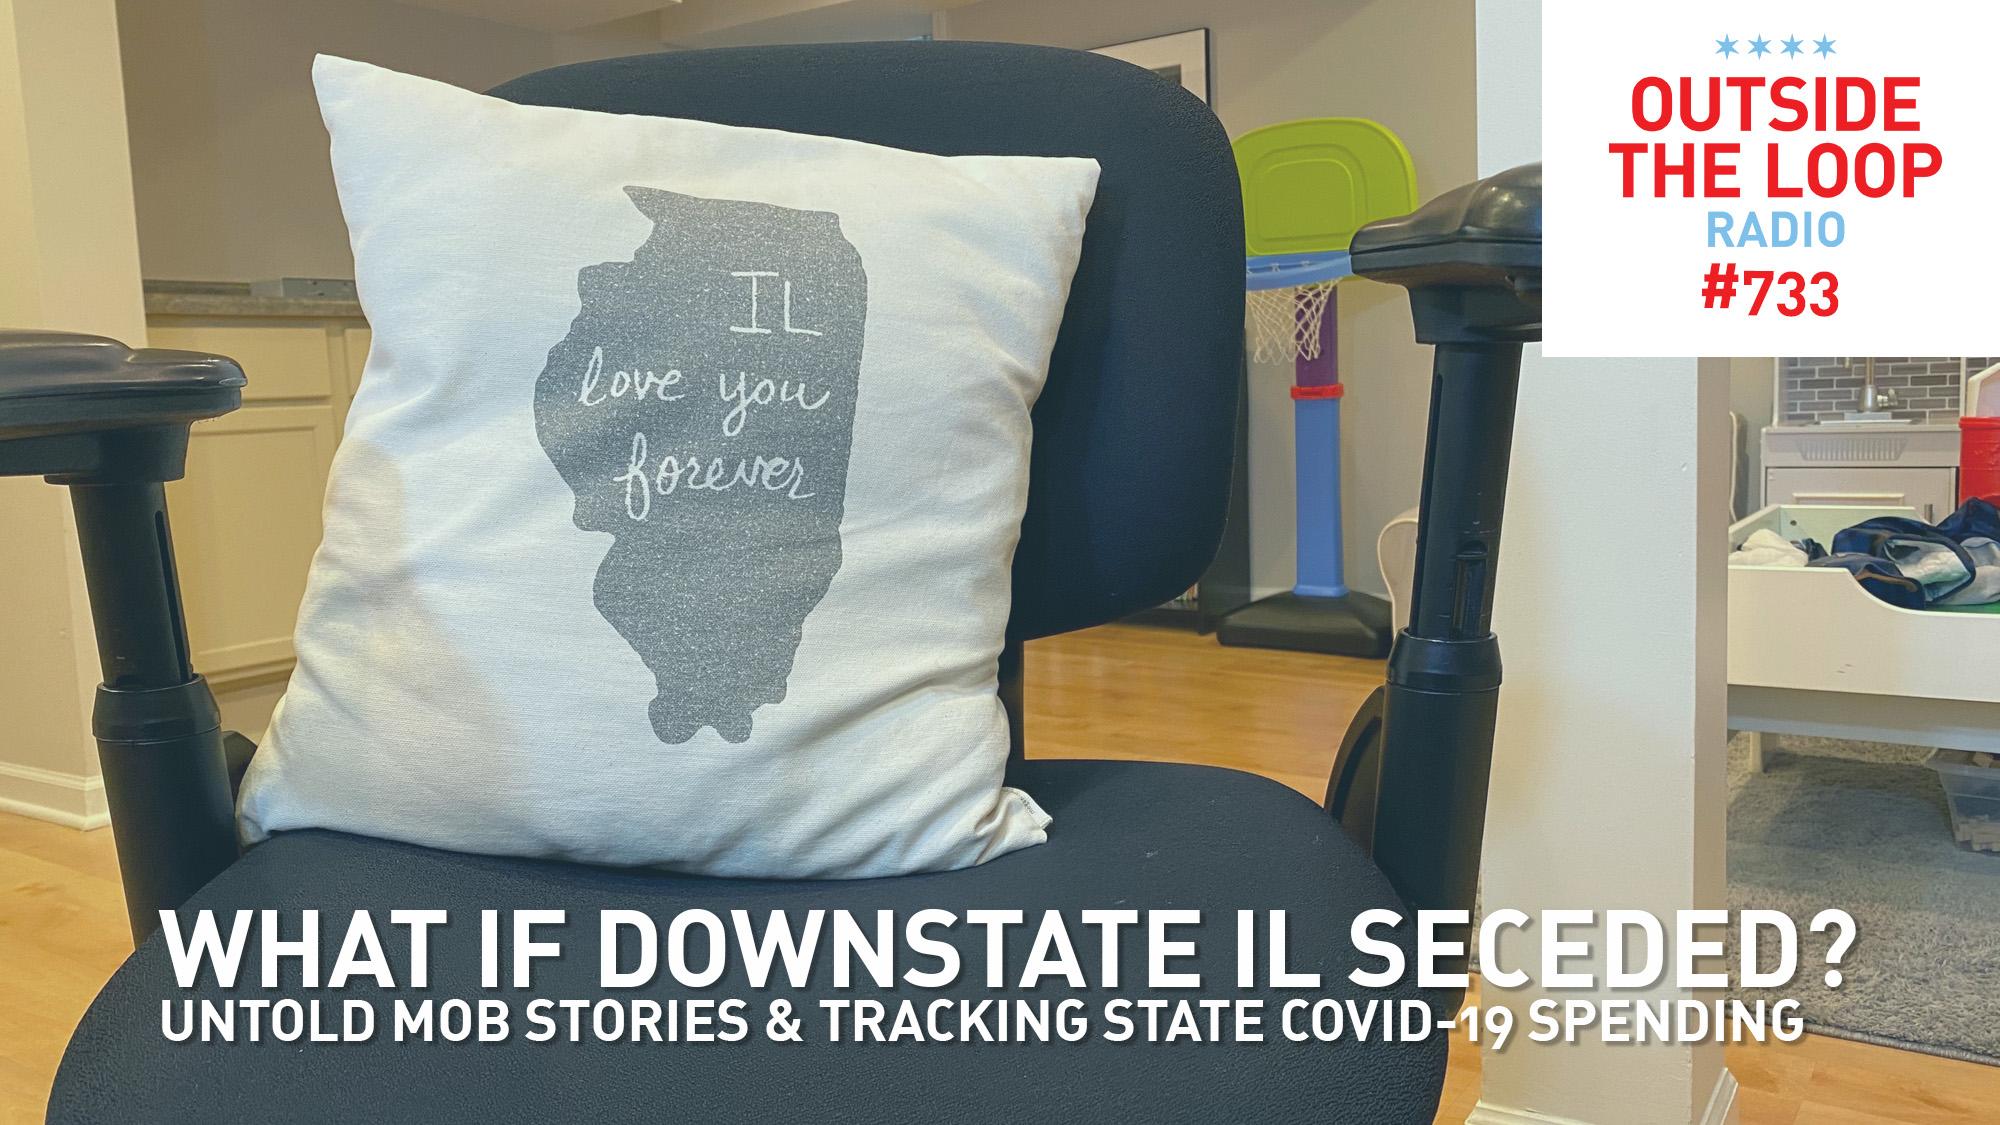 So much Illinois love!